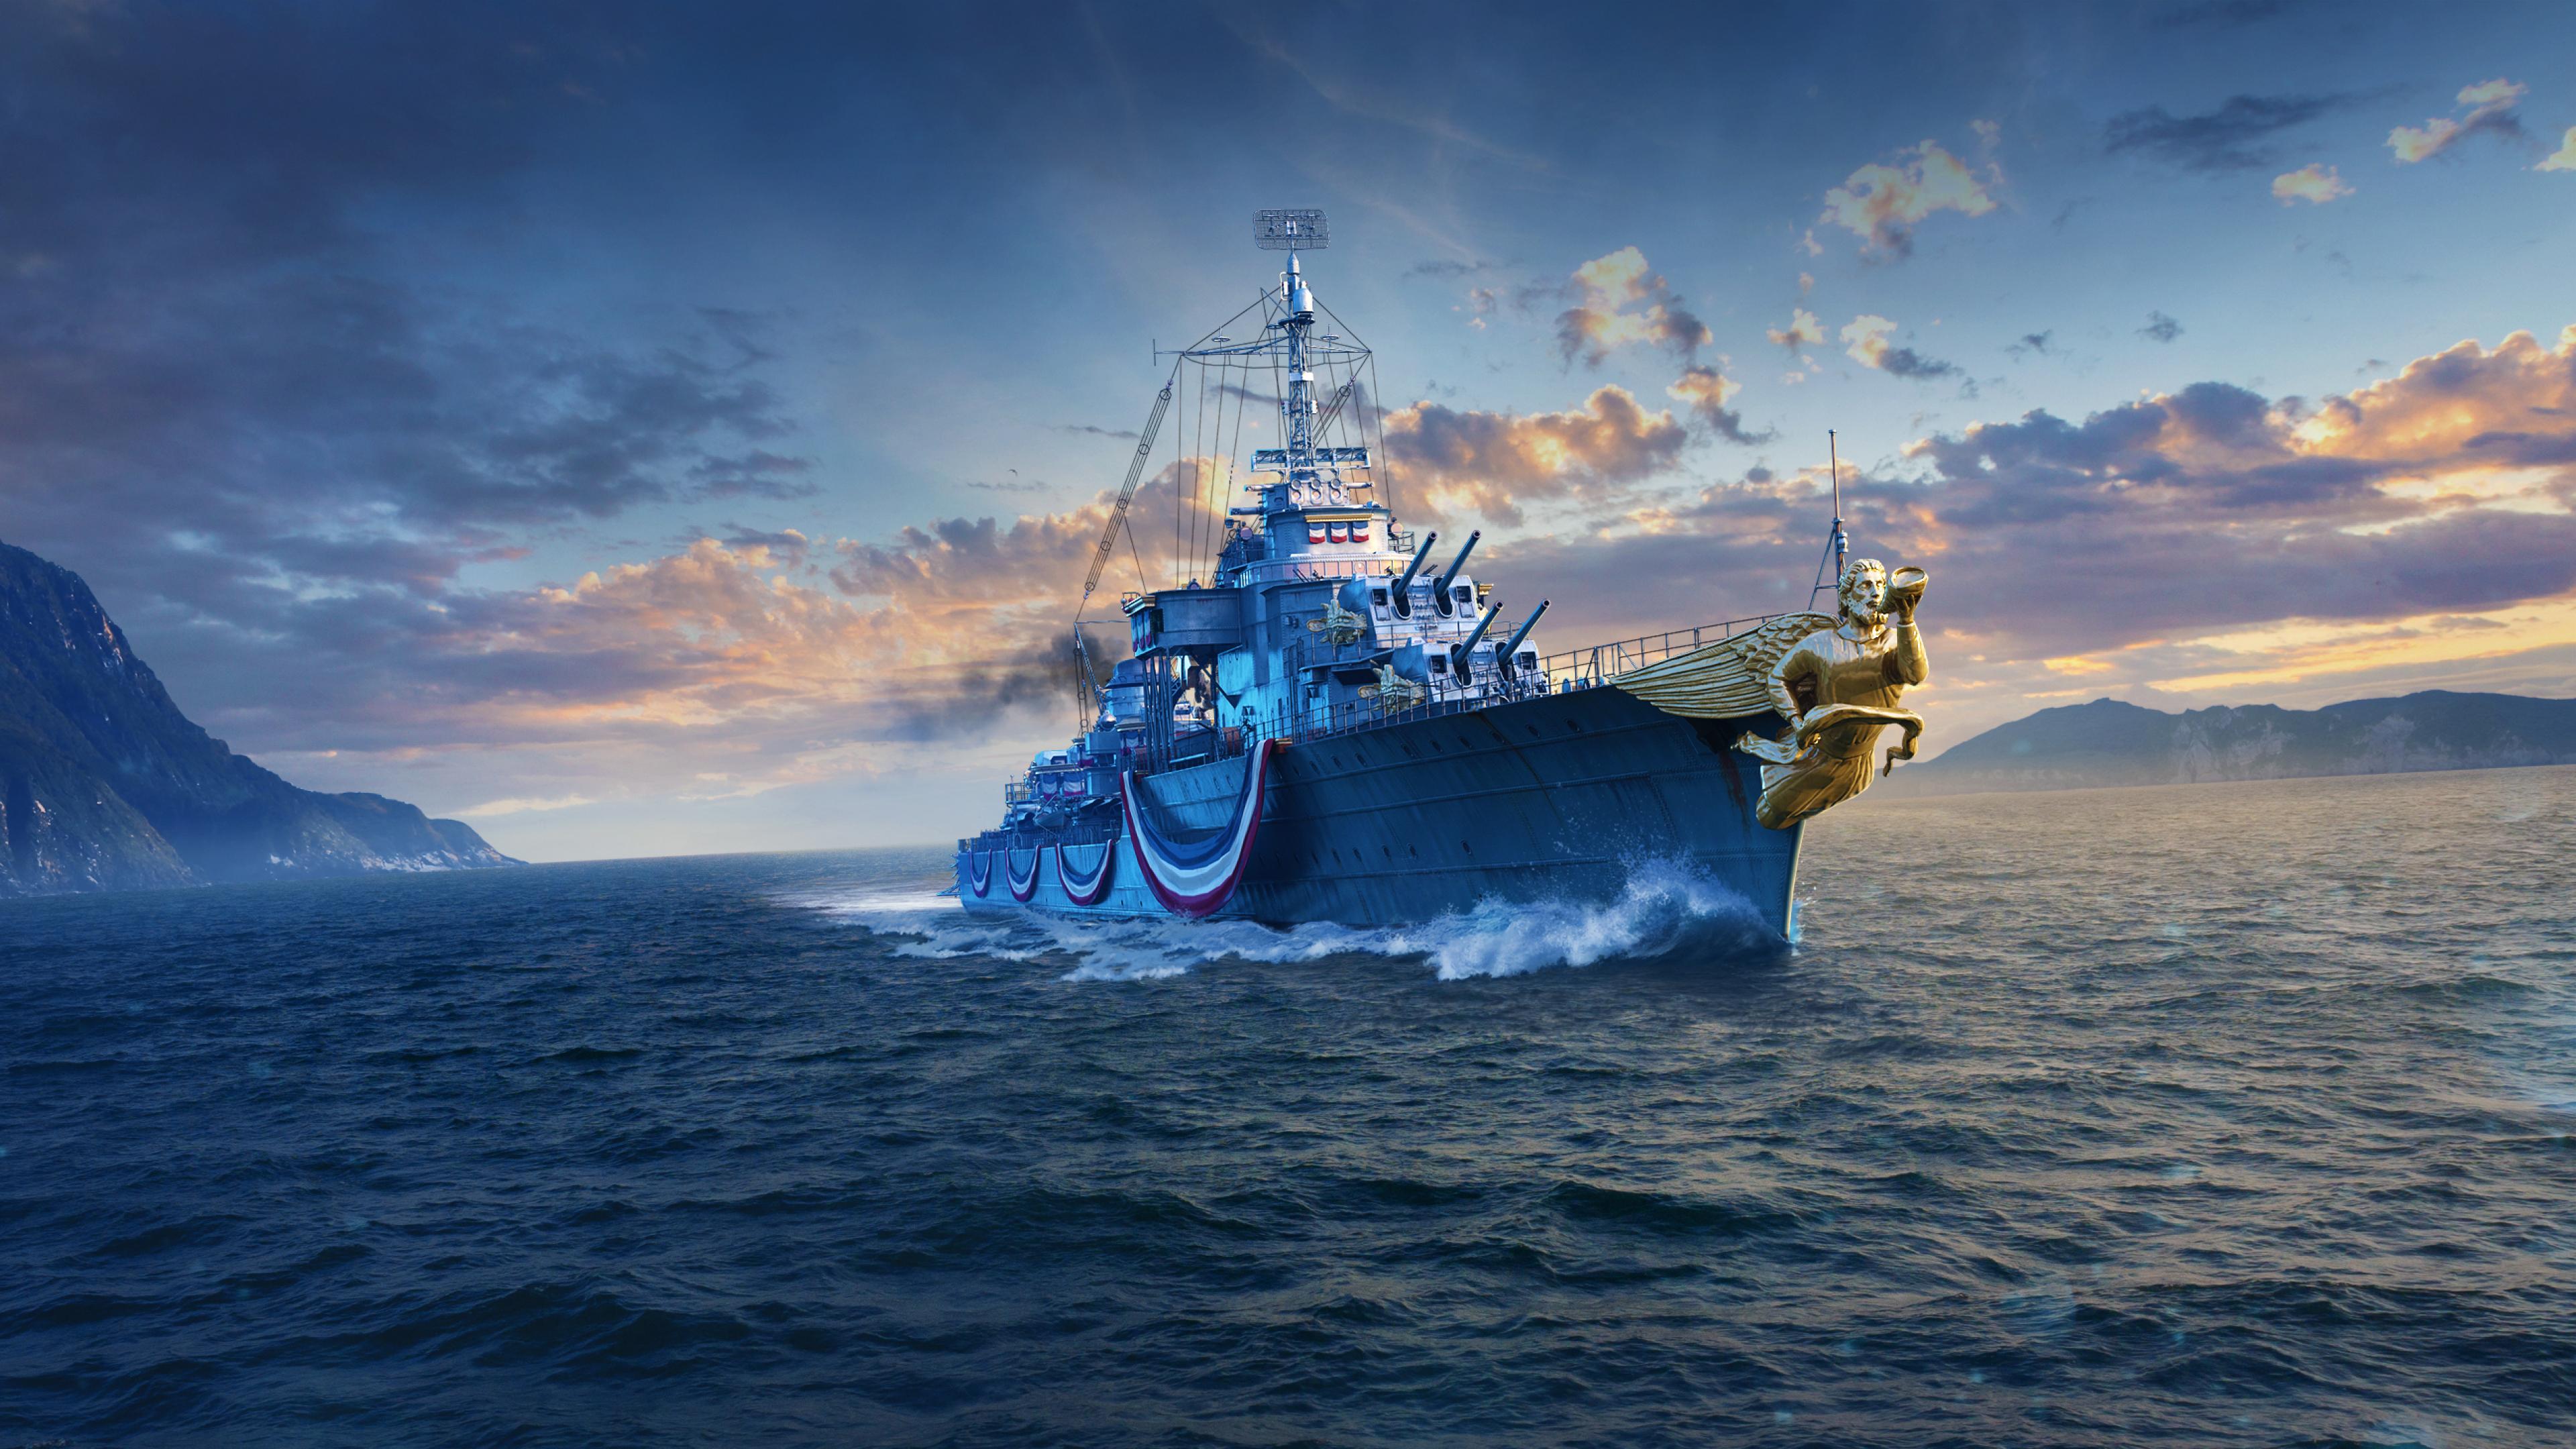 3840x2160 Mogador World Of Warships 4k Wallpaper Hd Games 4k